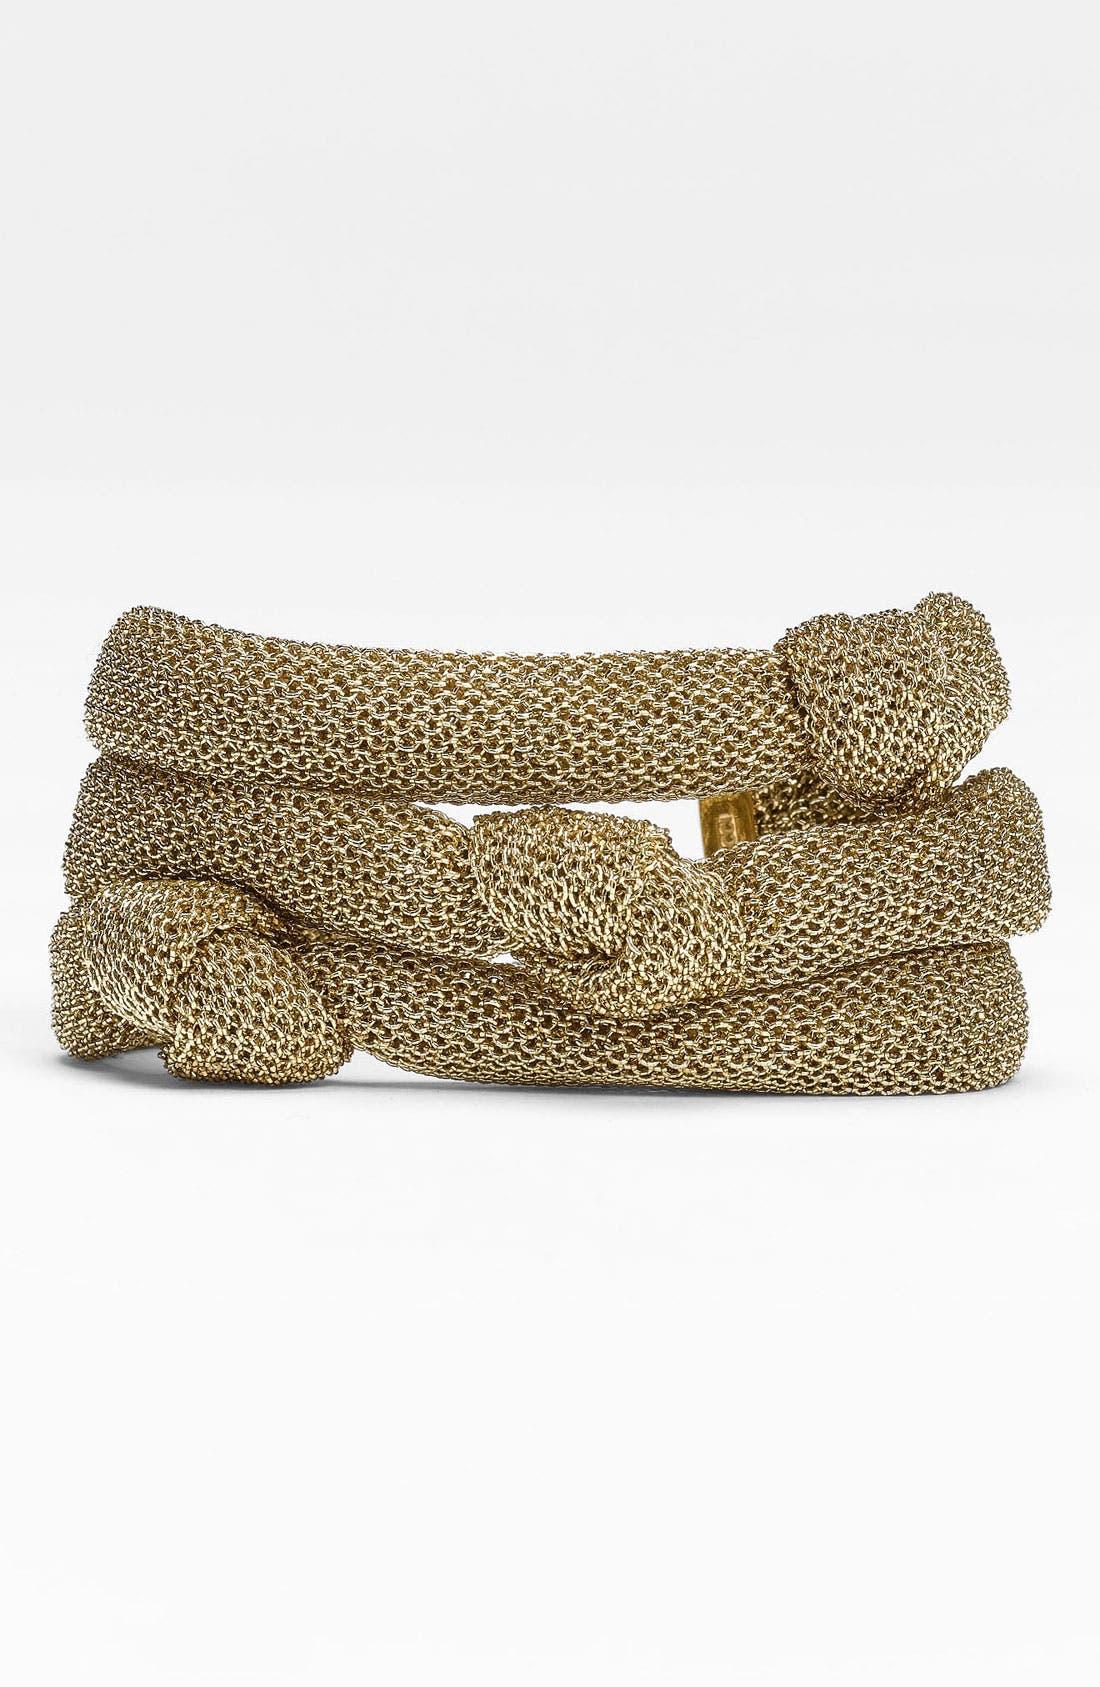 Alternate Image 1 Selected - Adami & Martucci 'Mesh' Knot Bracelet (Nordstrom Exclusive)